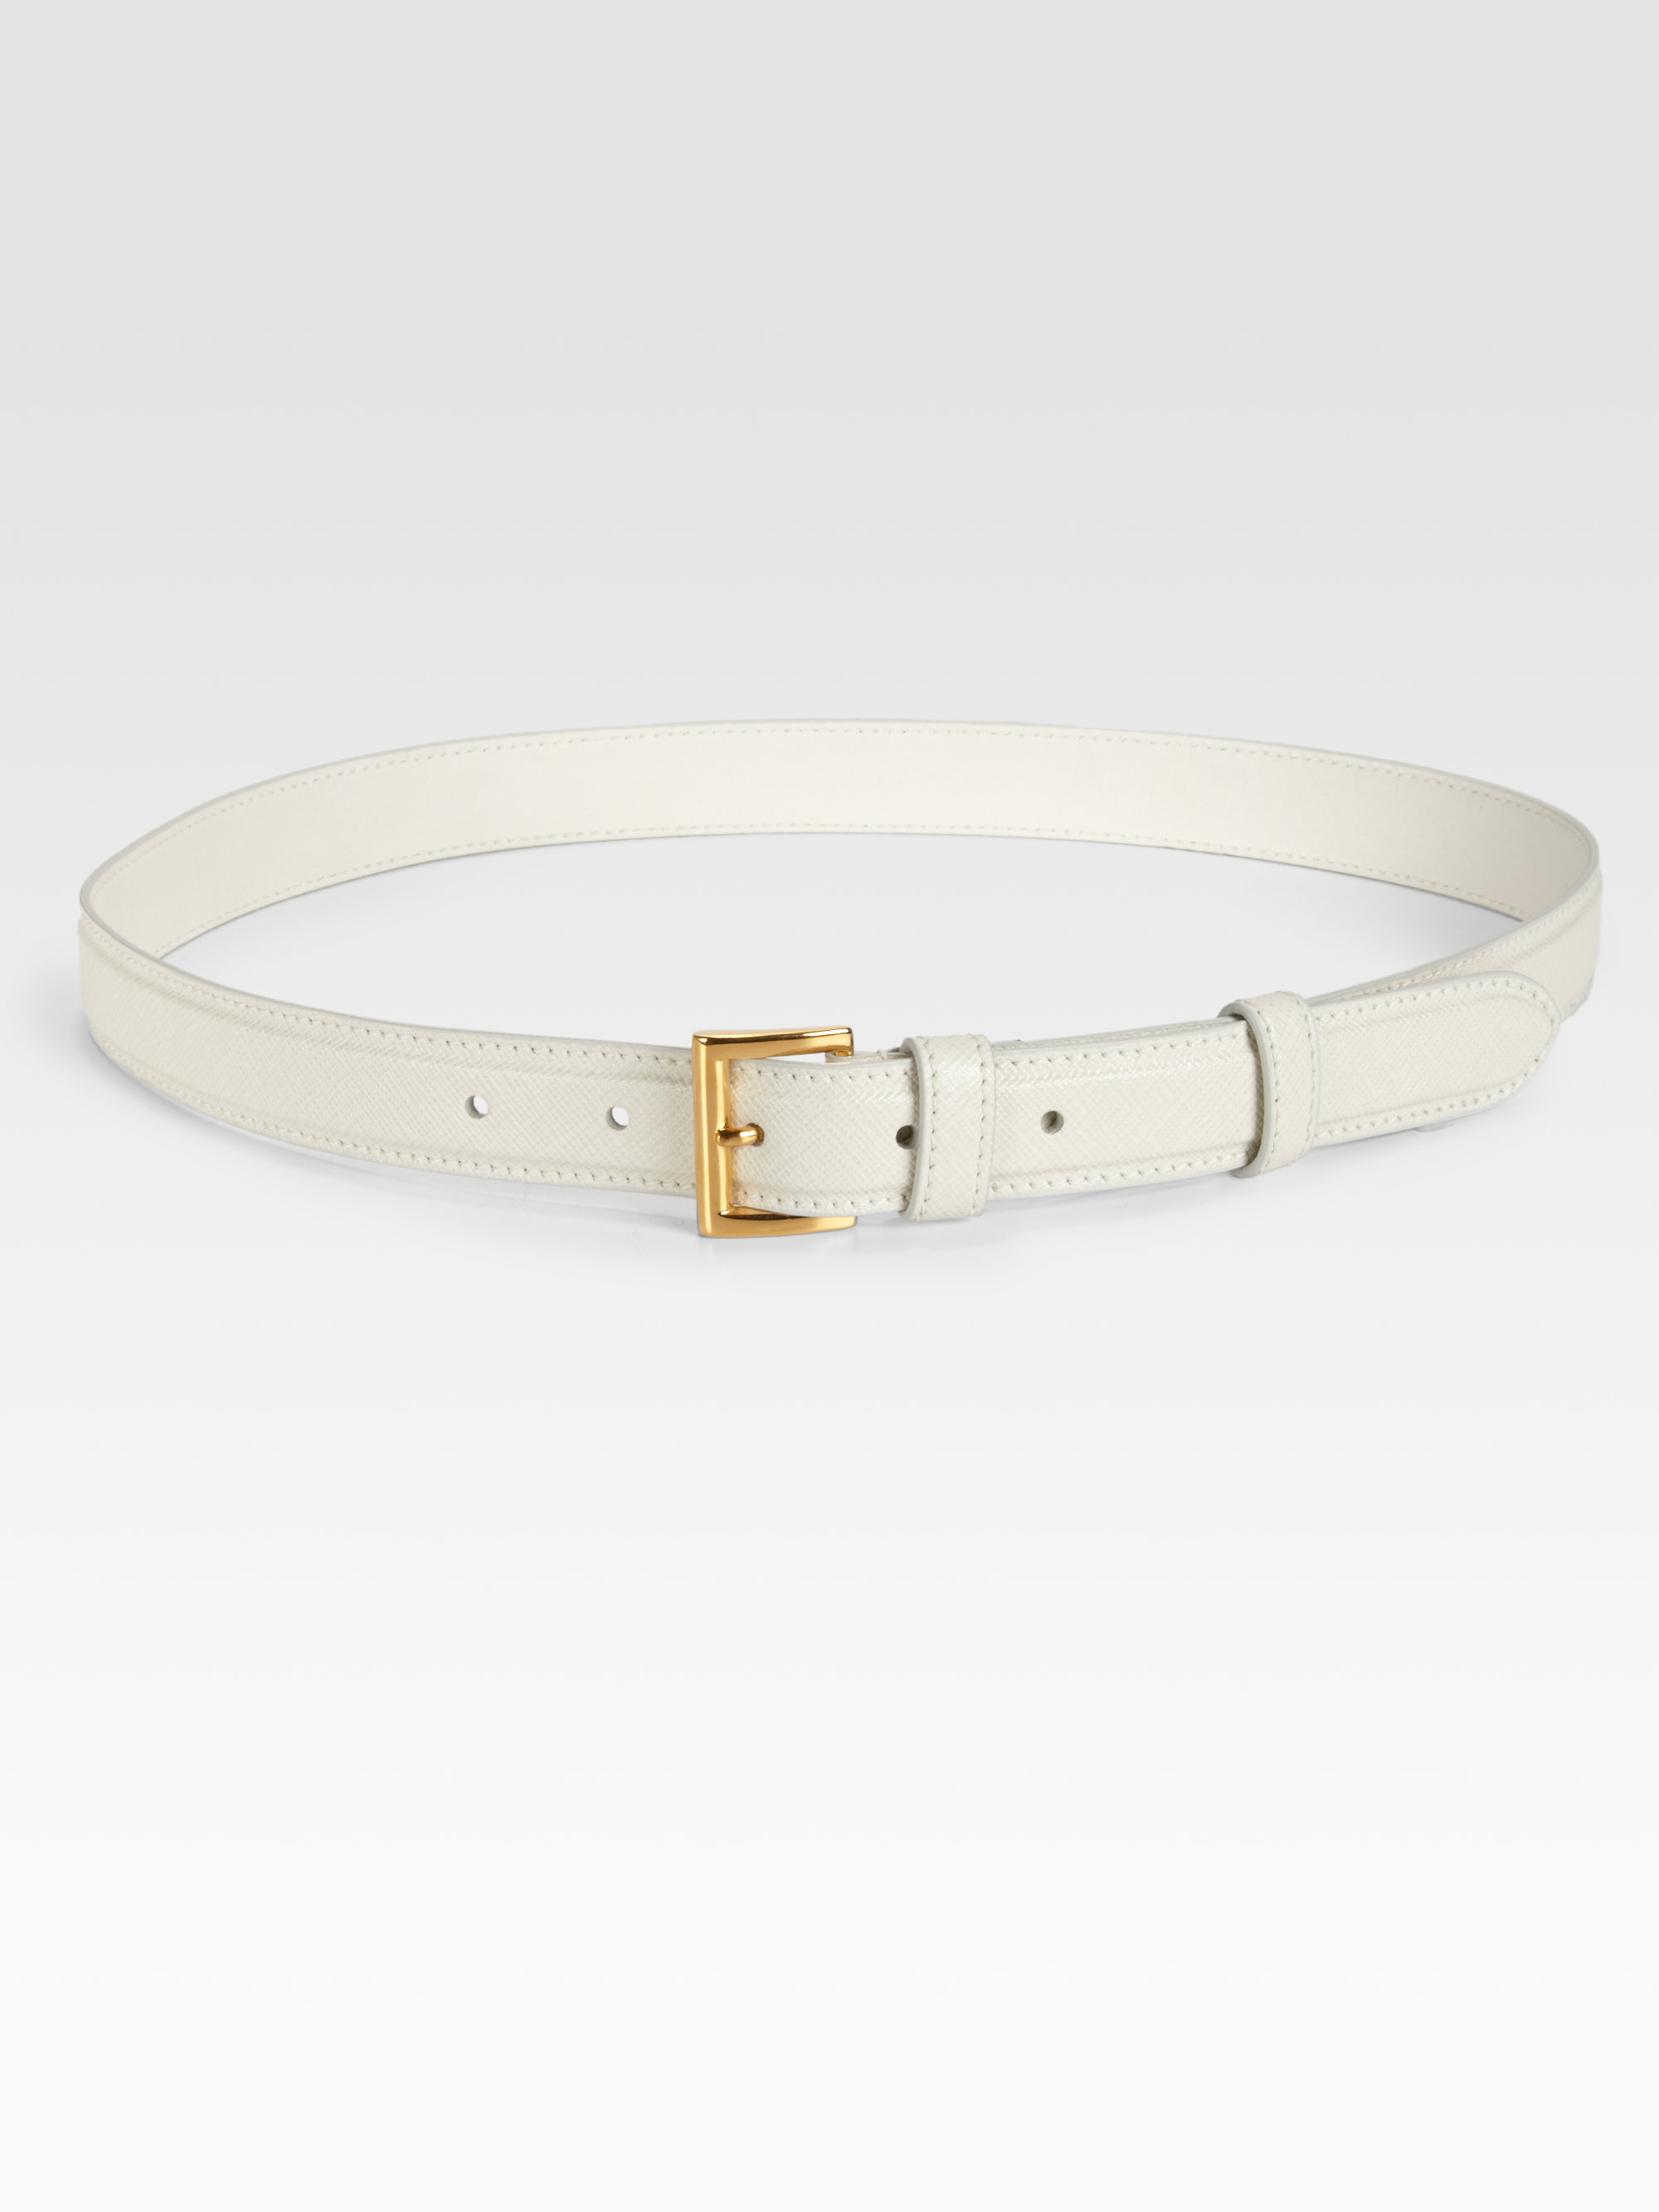 Prada Leather Belt in White (ivory) | Lyst